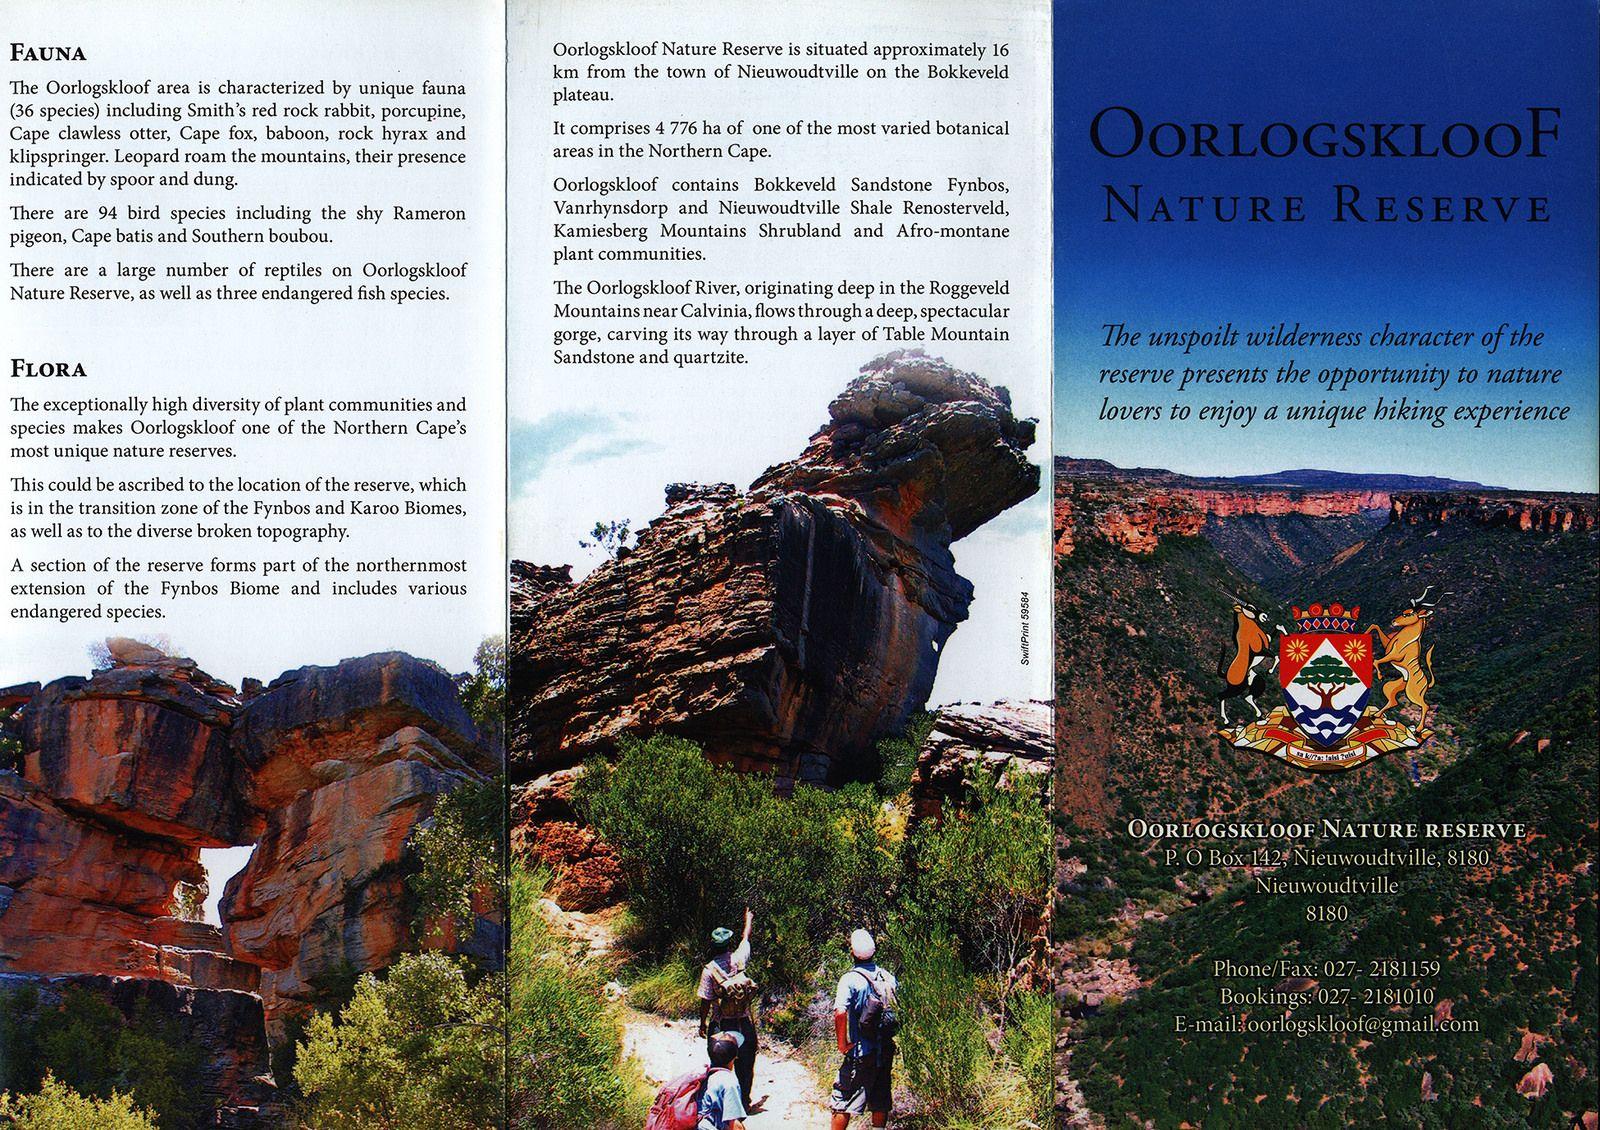 Oorlogskloof Nature Reserve; 2013, Northern Cape, South Africa | Nature  reserve, Northern cape, Nature